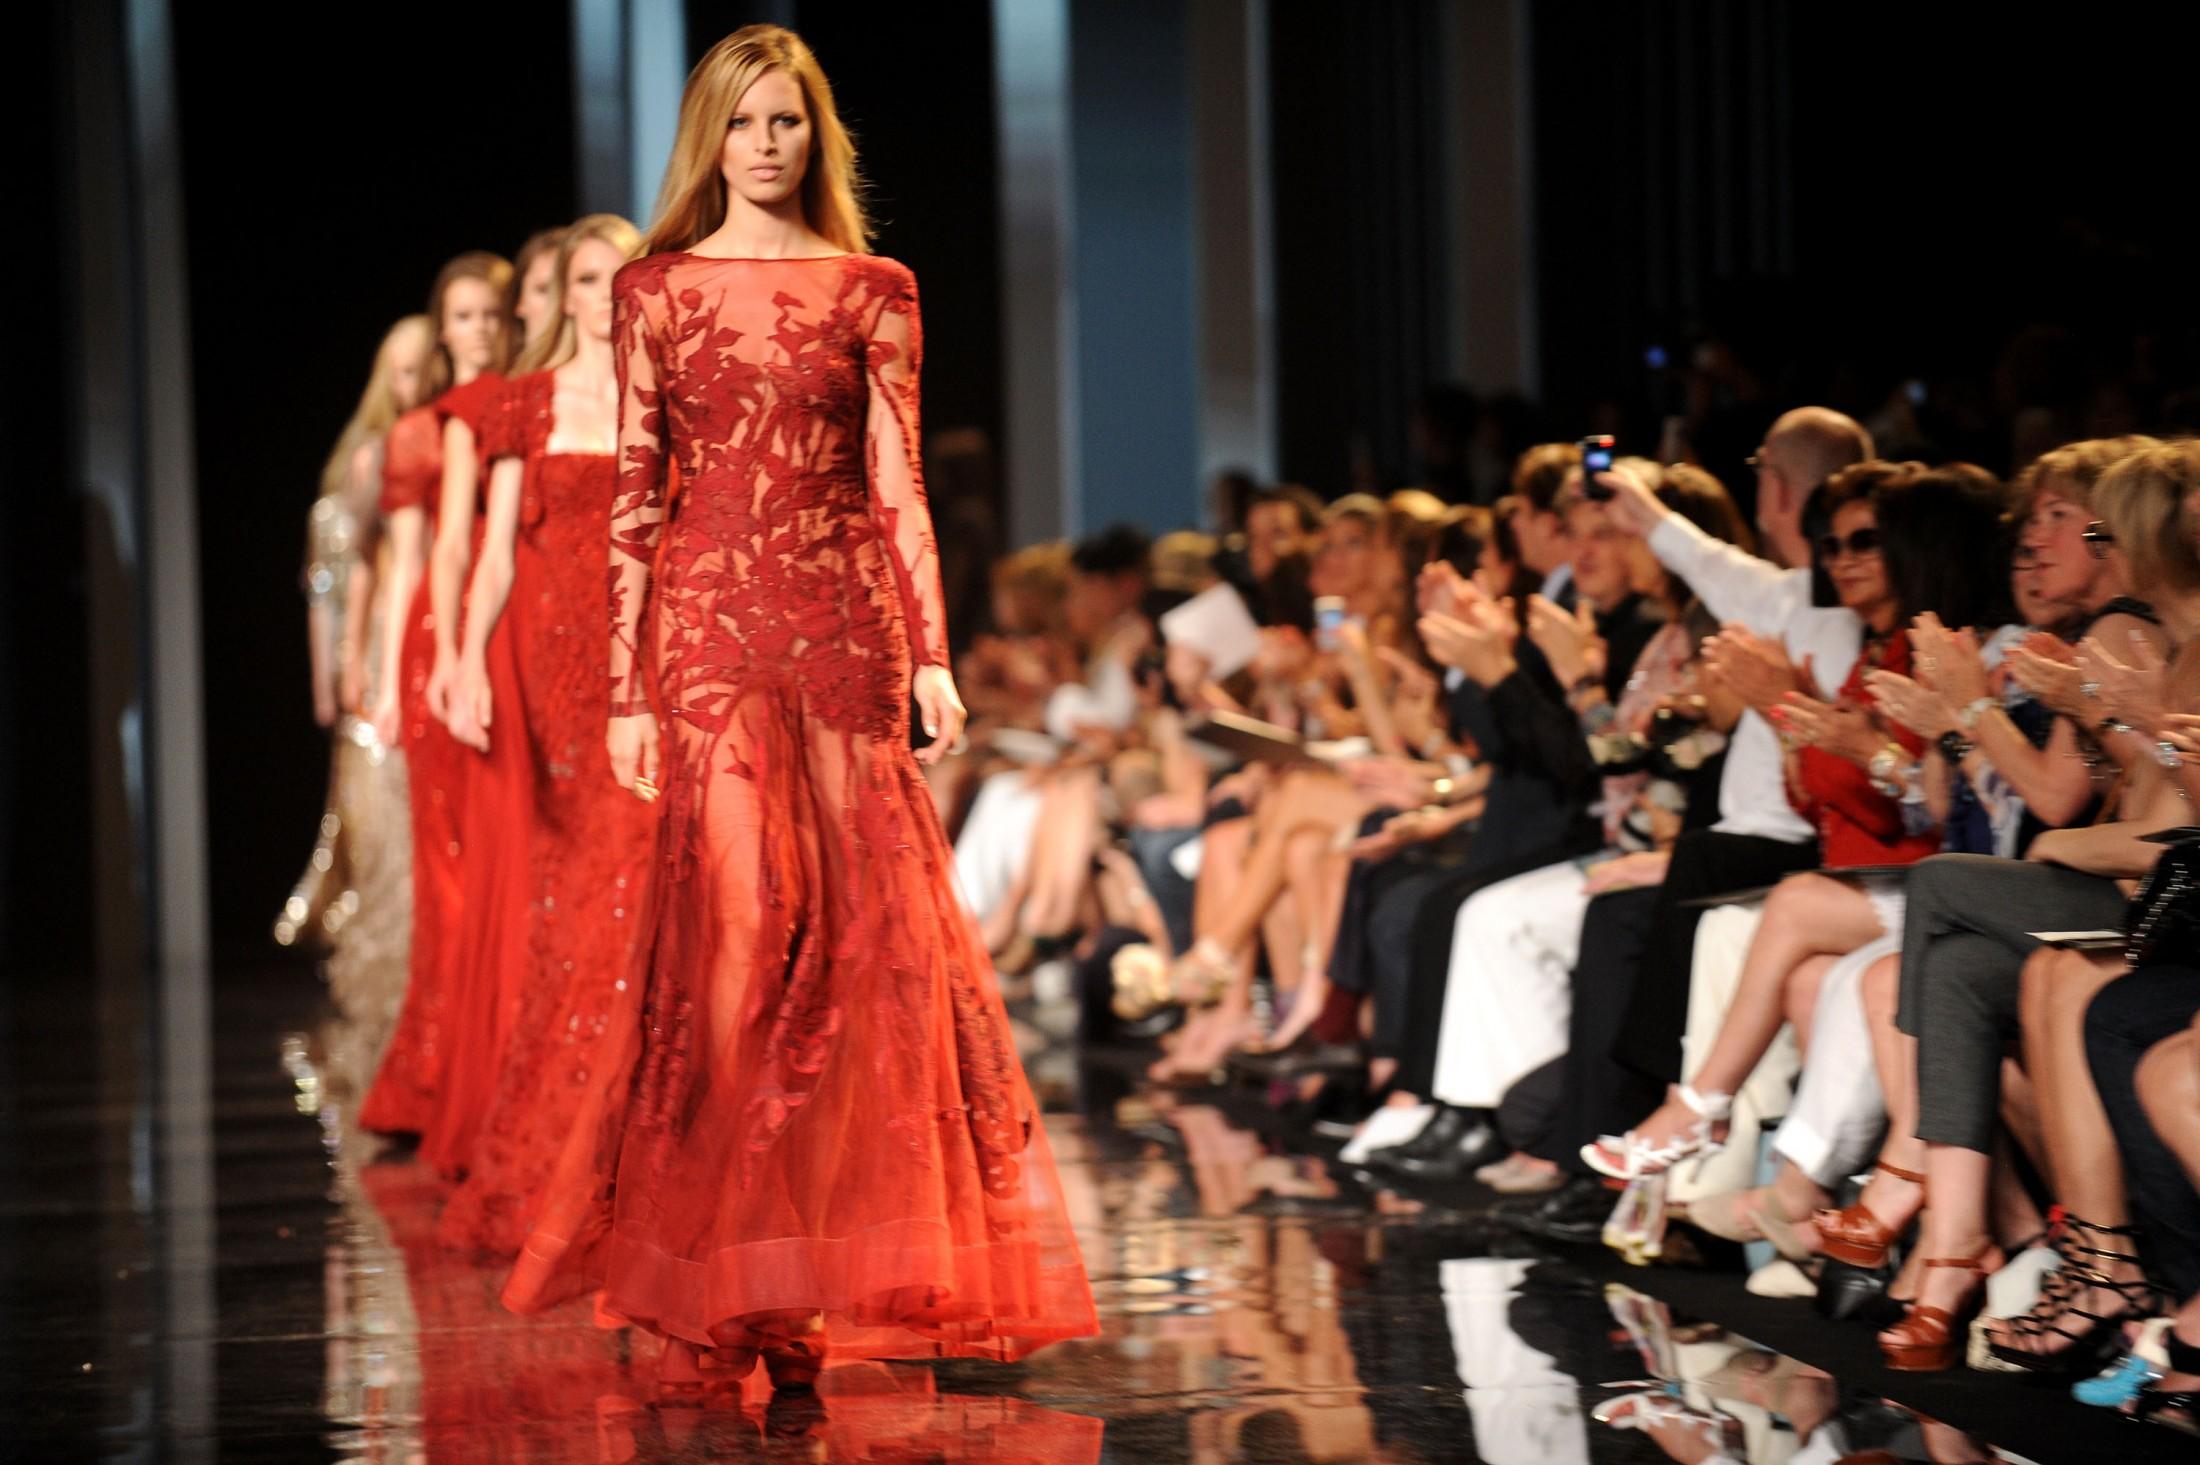 karolina kurkova 2010 2011 fashion show elie saab haute